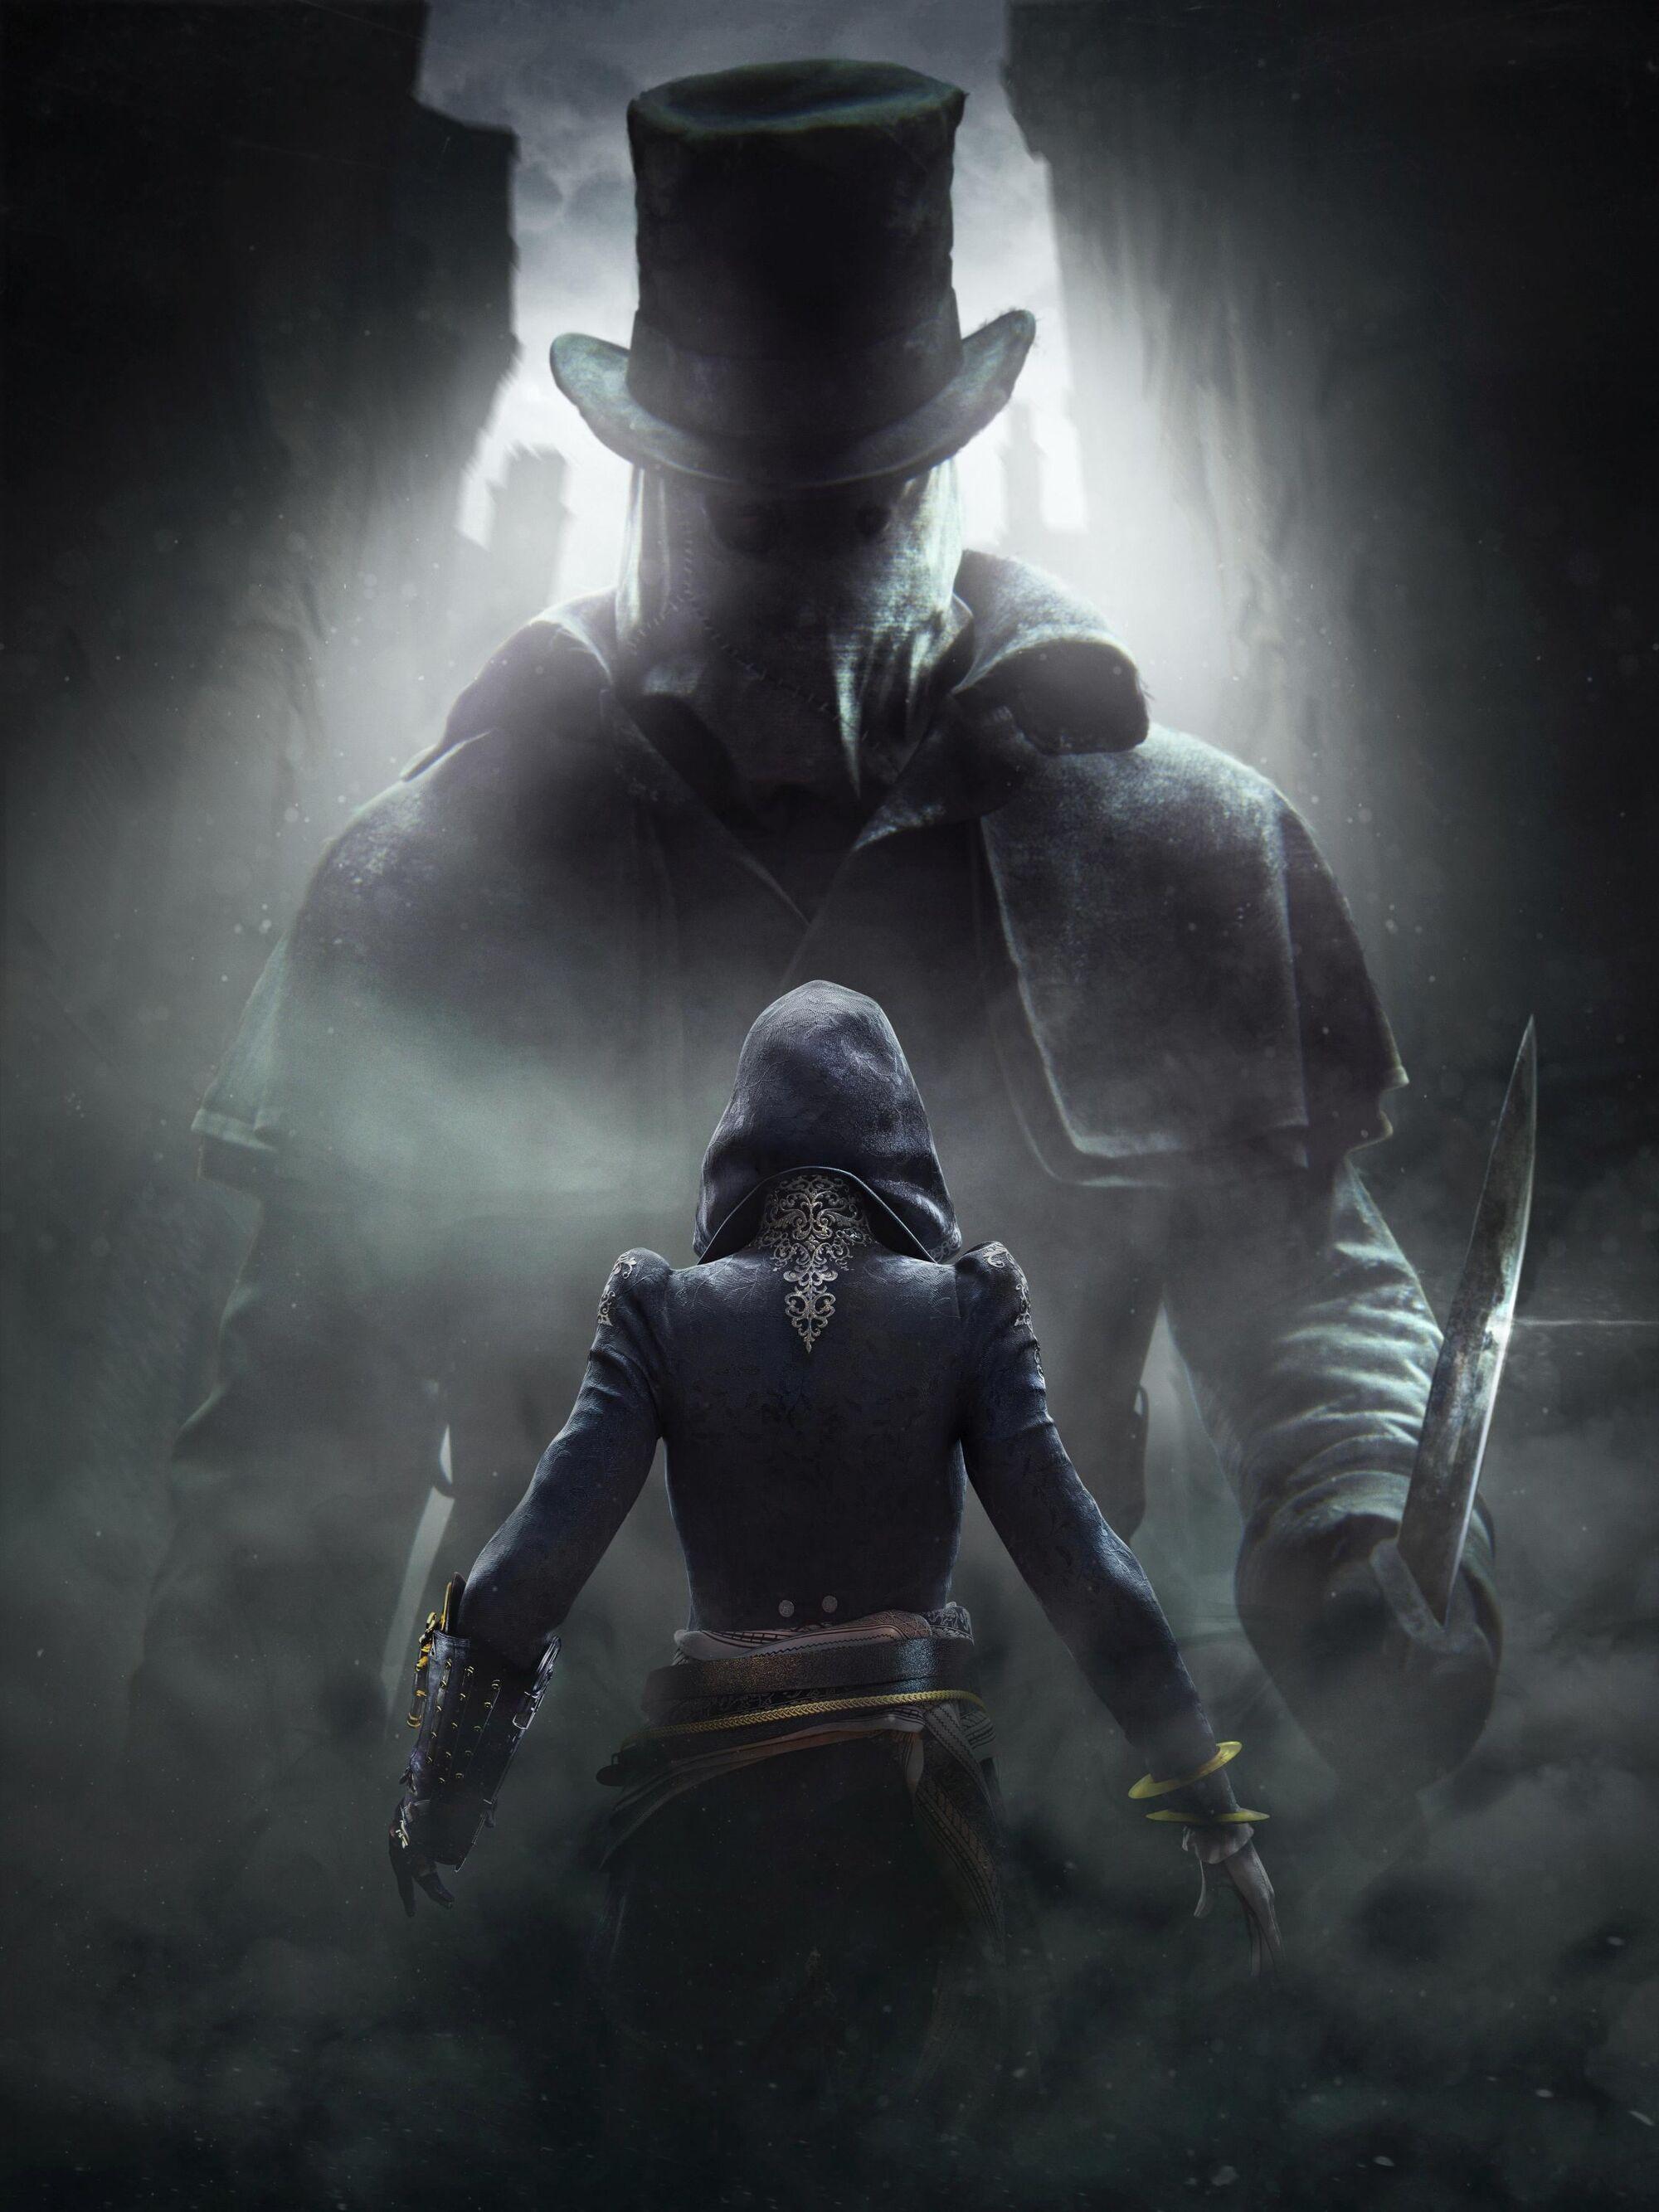 Jack the Ripper (DLC) | Assassin's Creed Wiki | FANDOM